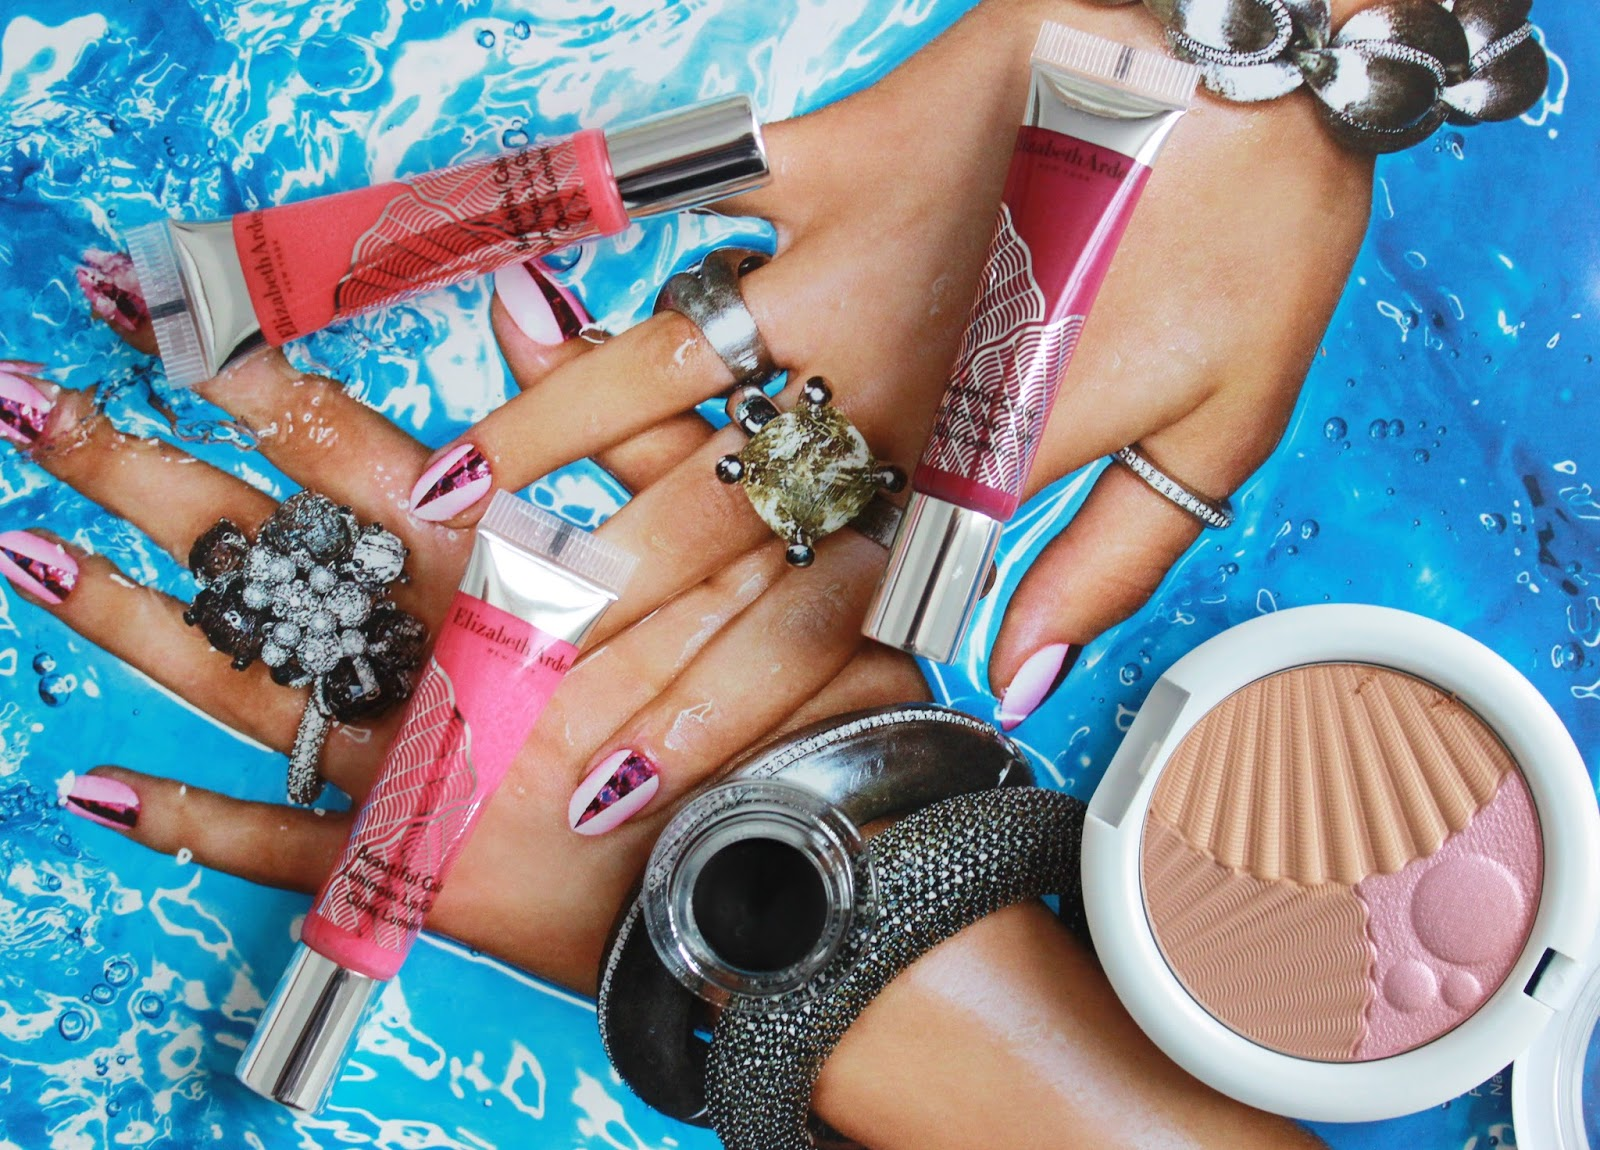 Elizabeth Arden Sunkissed pearls ss15 makeup range